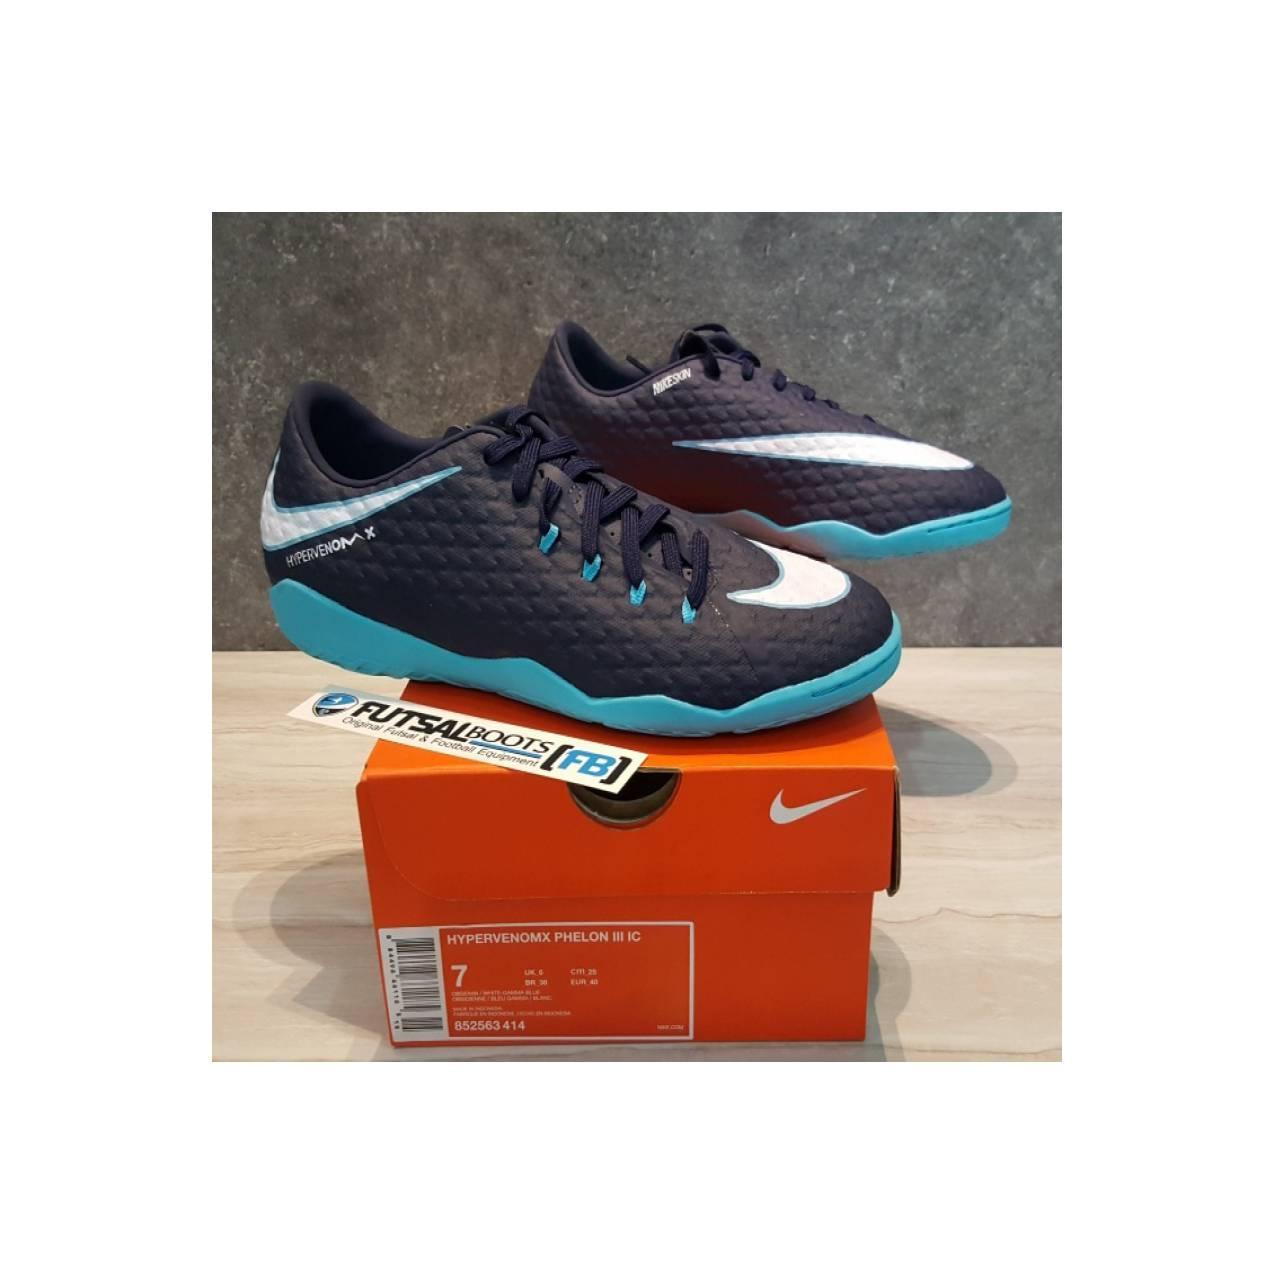 Sepatu Futsal Nike Hypervenom X Phelon III IC - Obsidian/White